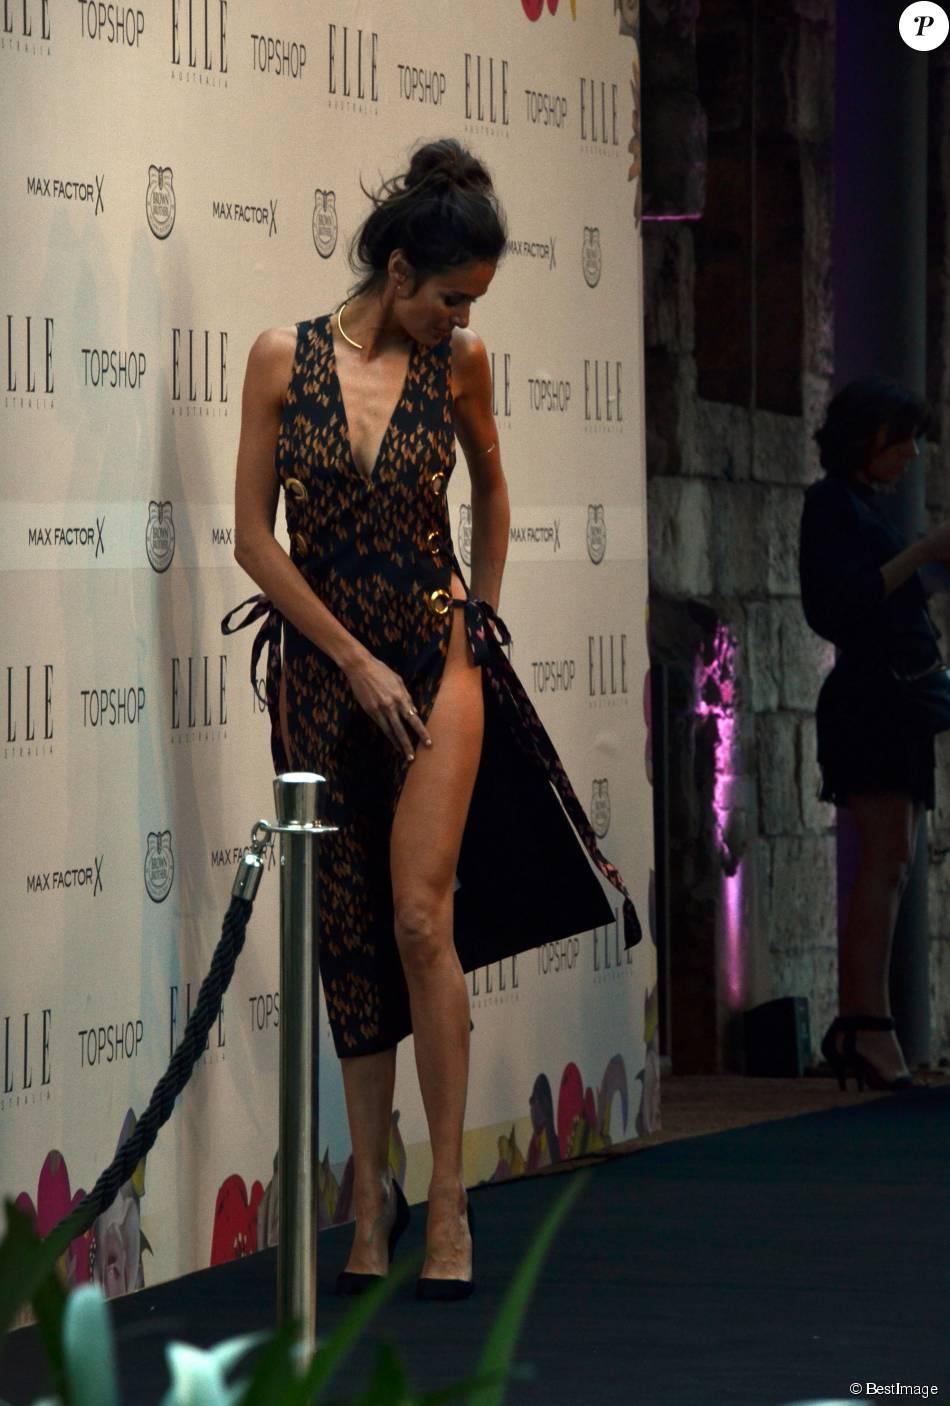 nudes (14 photos), Leaked Celebrity pics